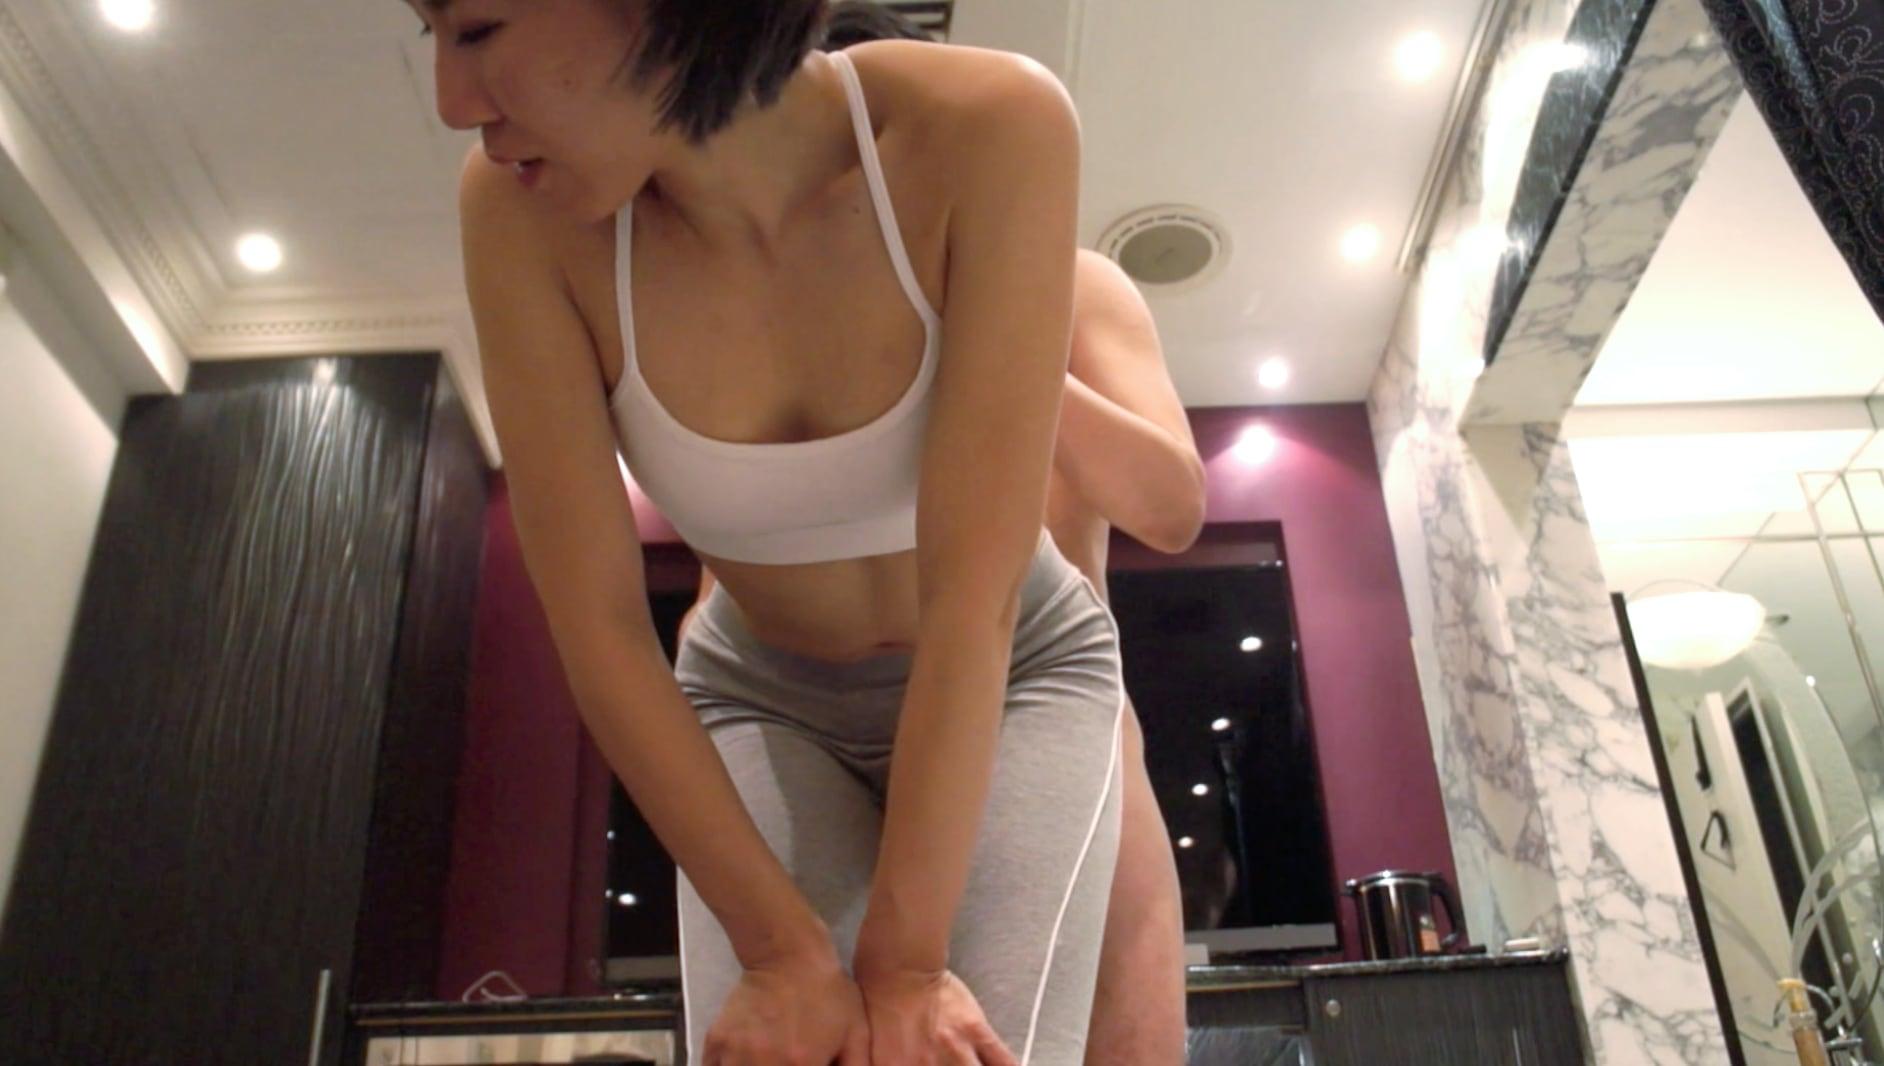 FC2-PPV 1757073-2 Hidden Camera By A Woman J K Who Tears Off Forbidden Love With A Married Teacher True Icharab Sex - Part 2